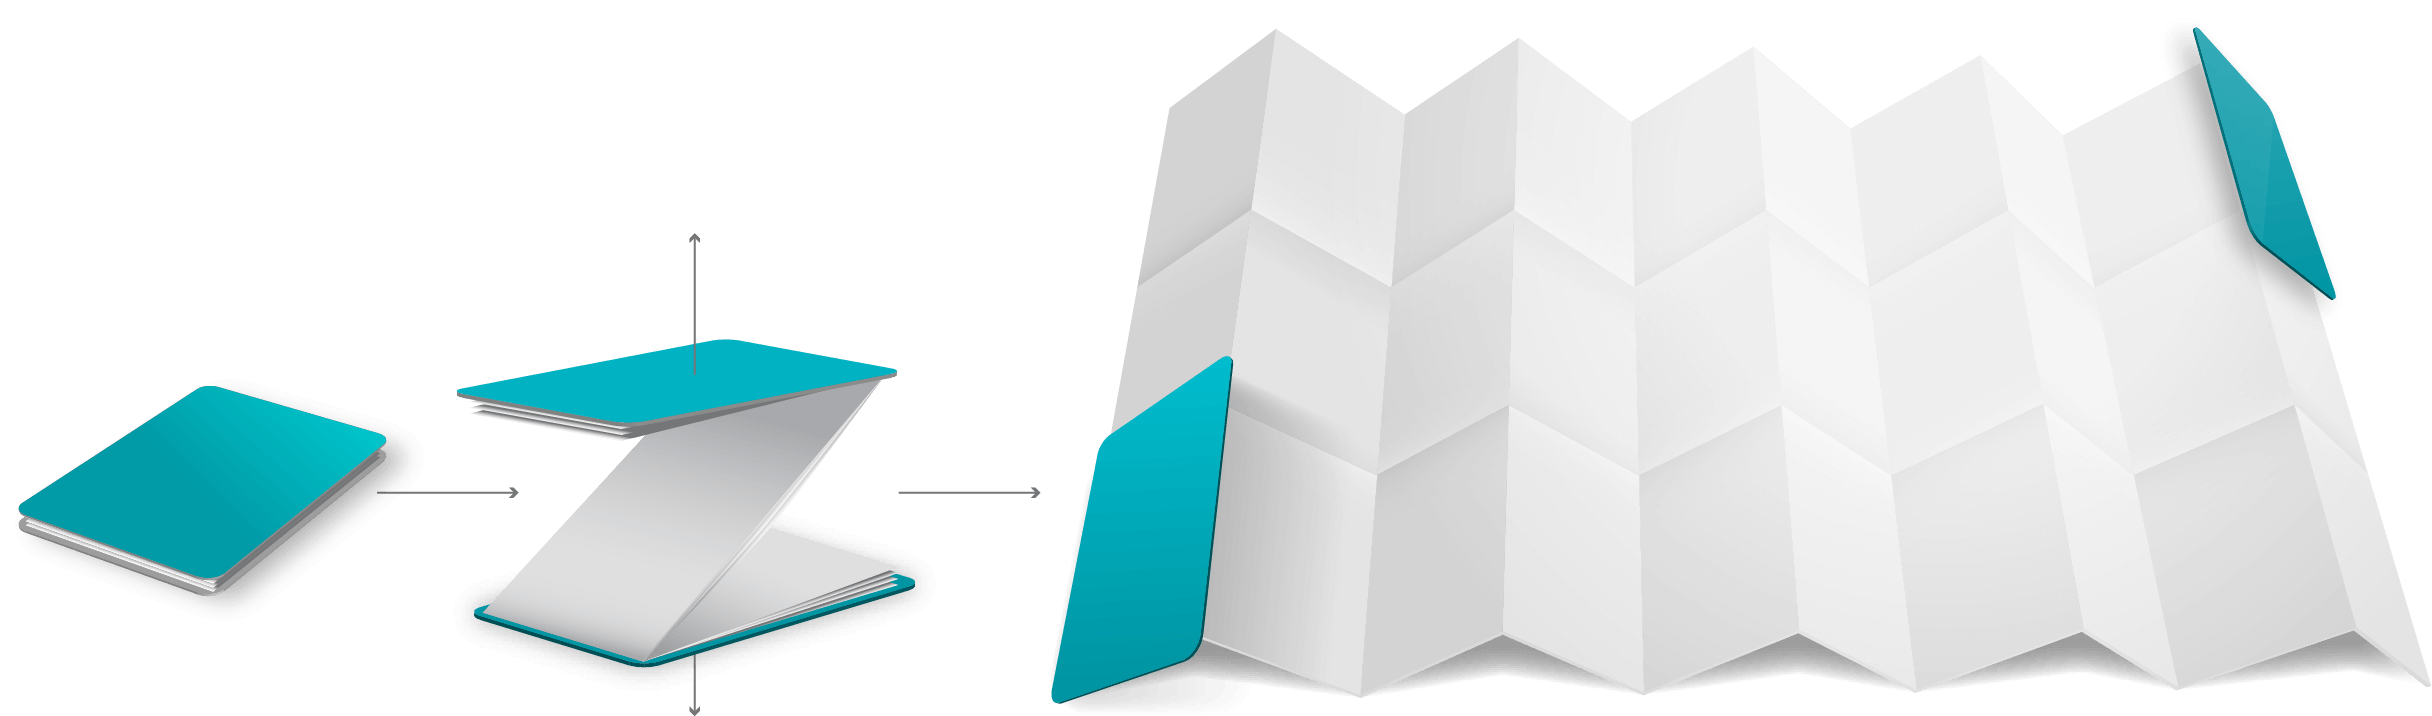 Triple Row Pocket Map